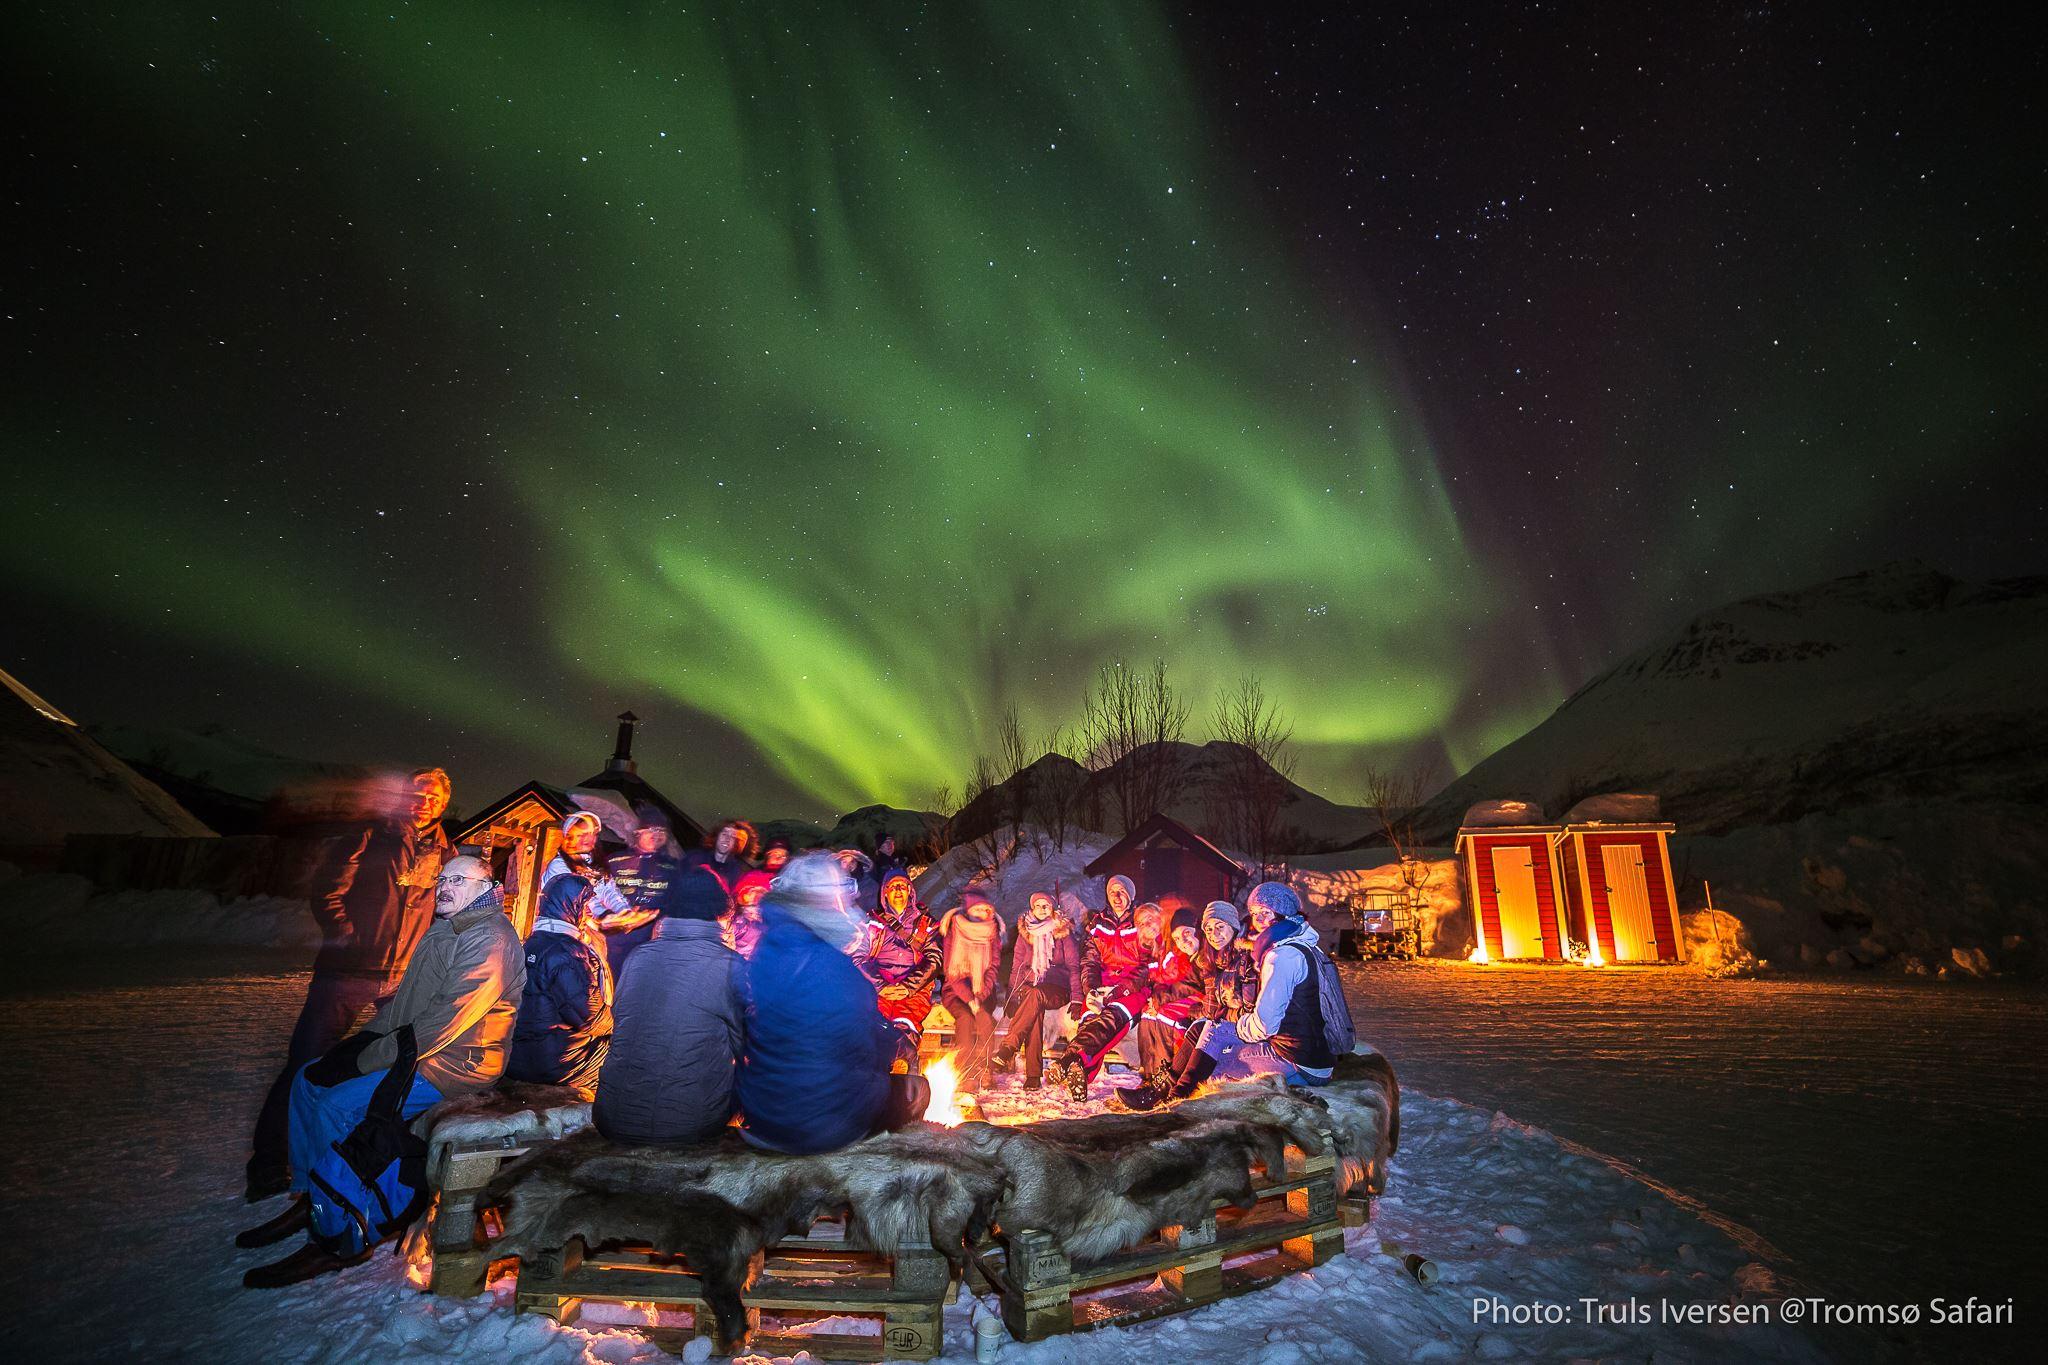 Aurora Safari basestasjoner - Tromsø Safari